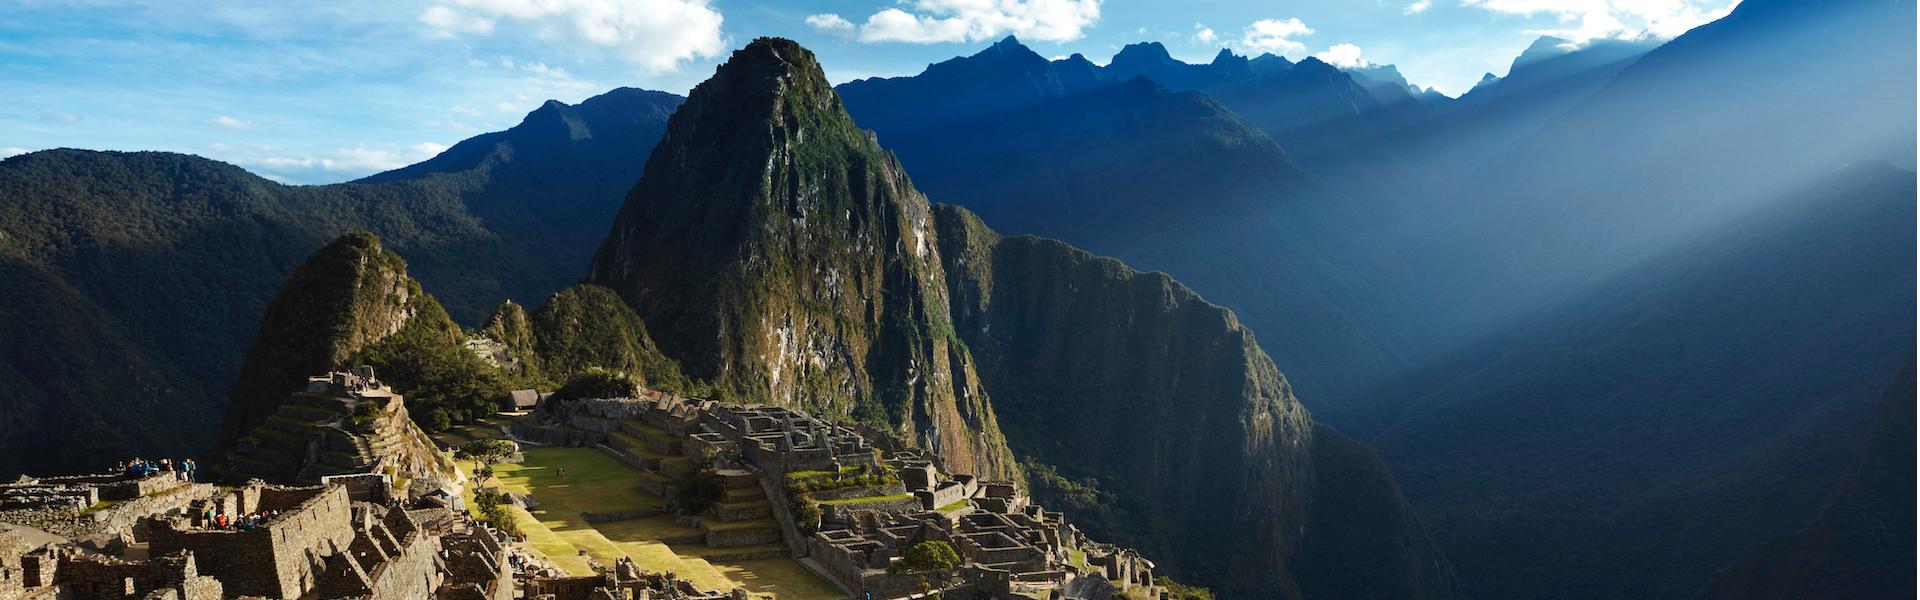 Peru Blog